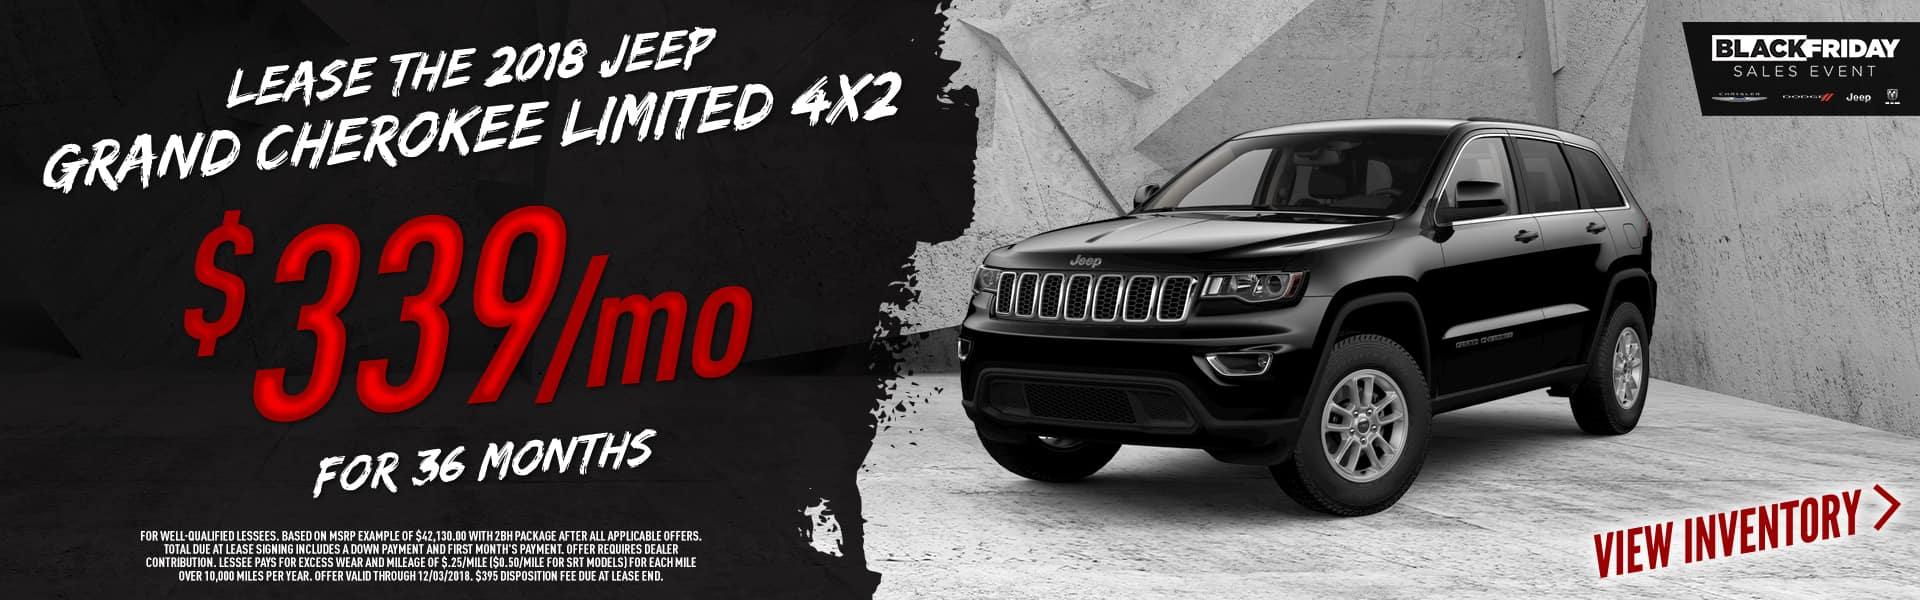 beaumont-tx-deals-near-me-2018-jeep-grand-cherokee